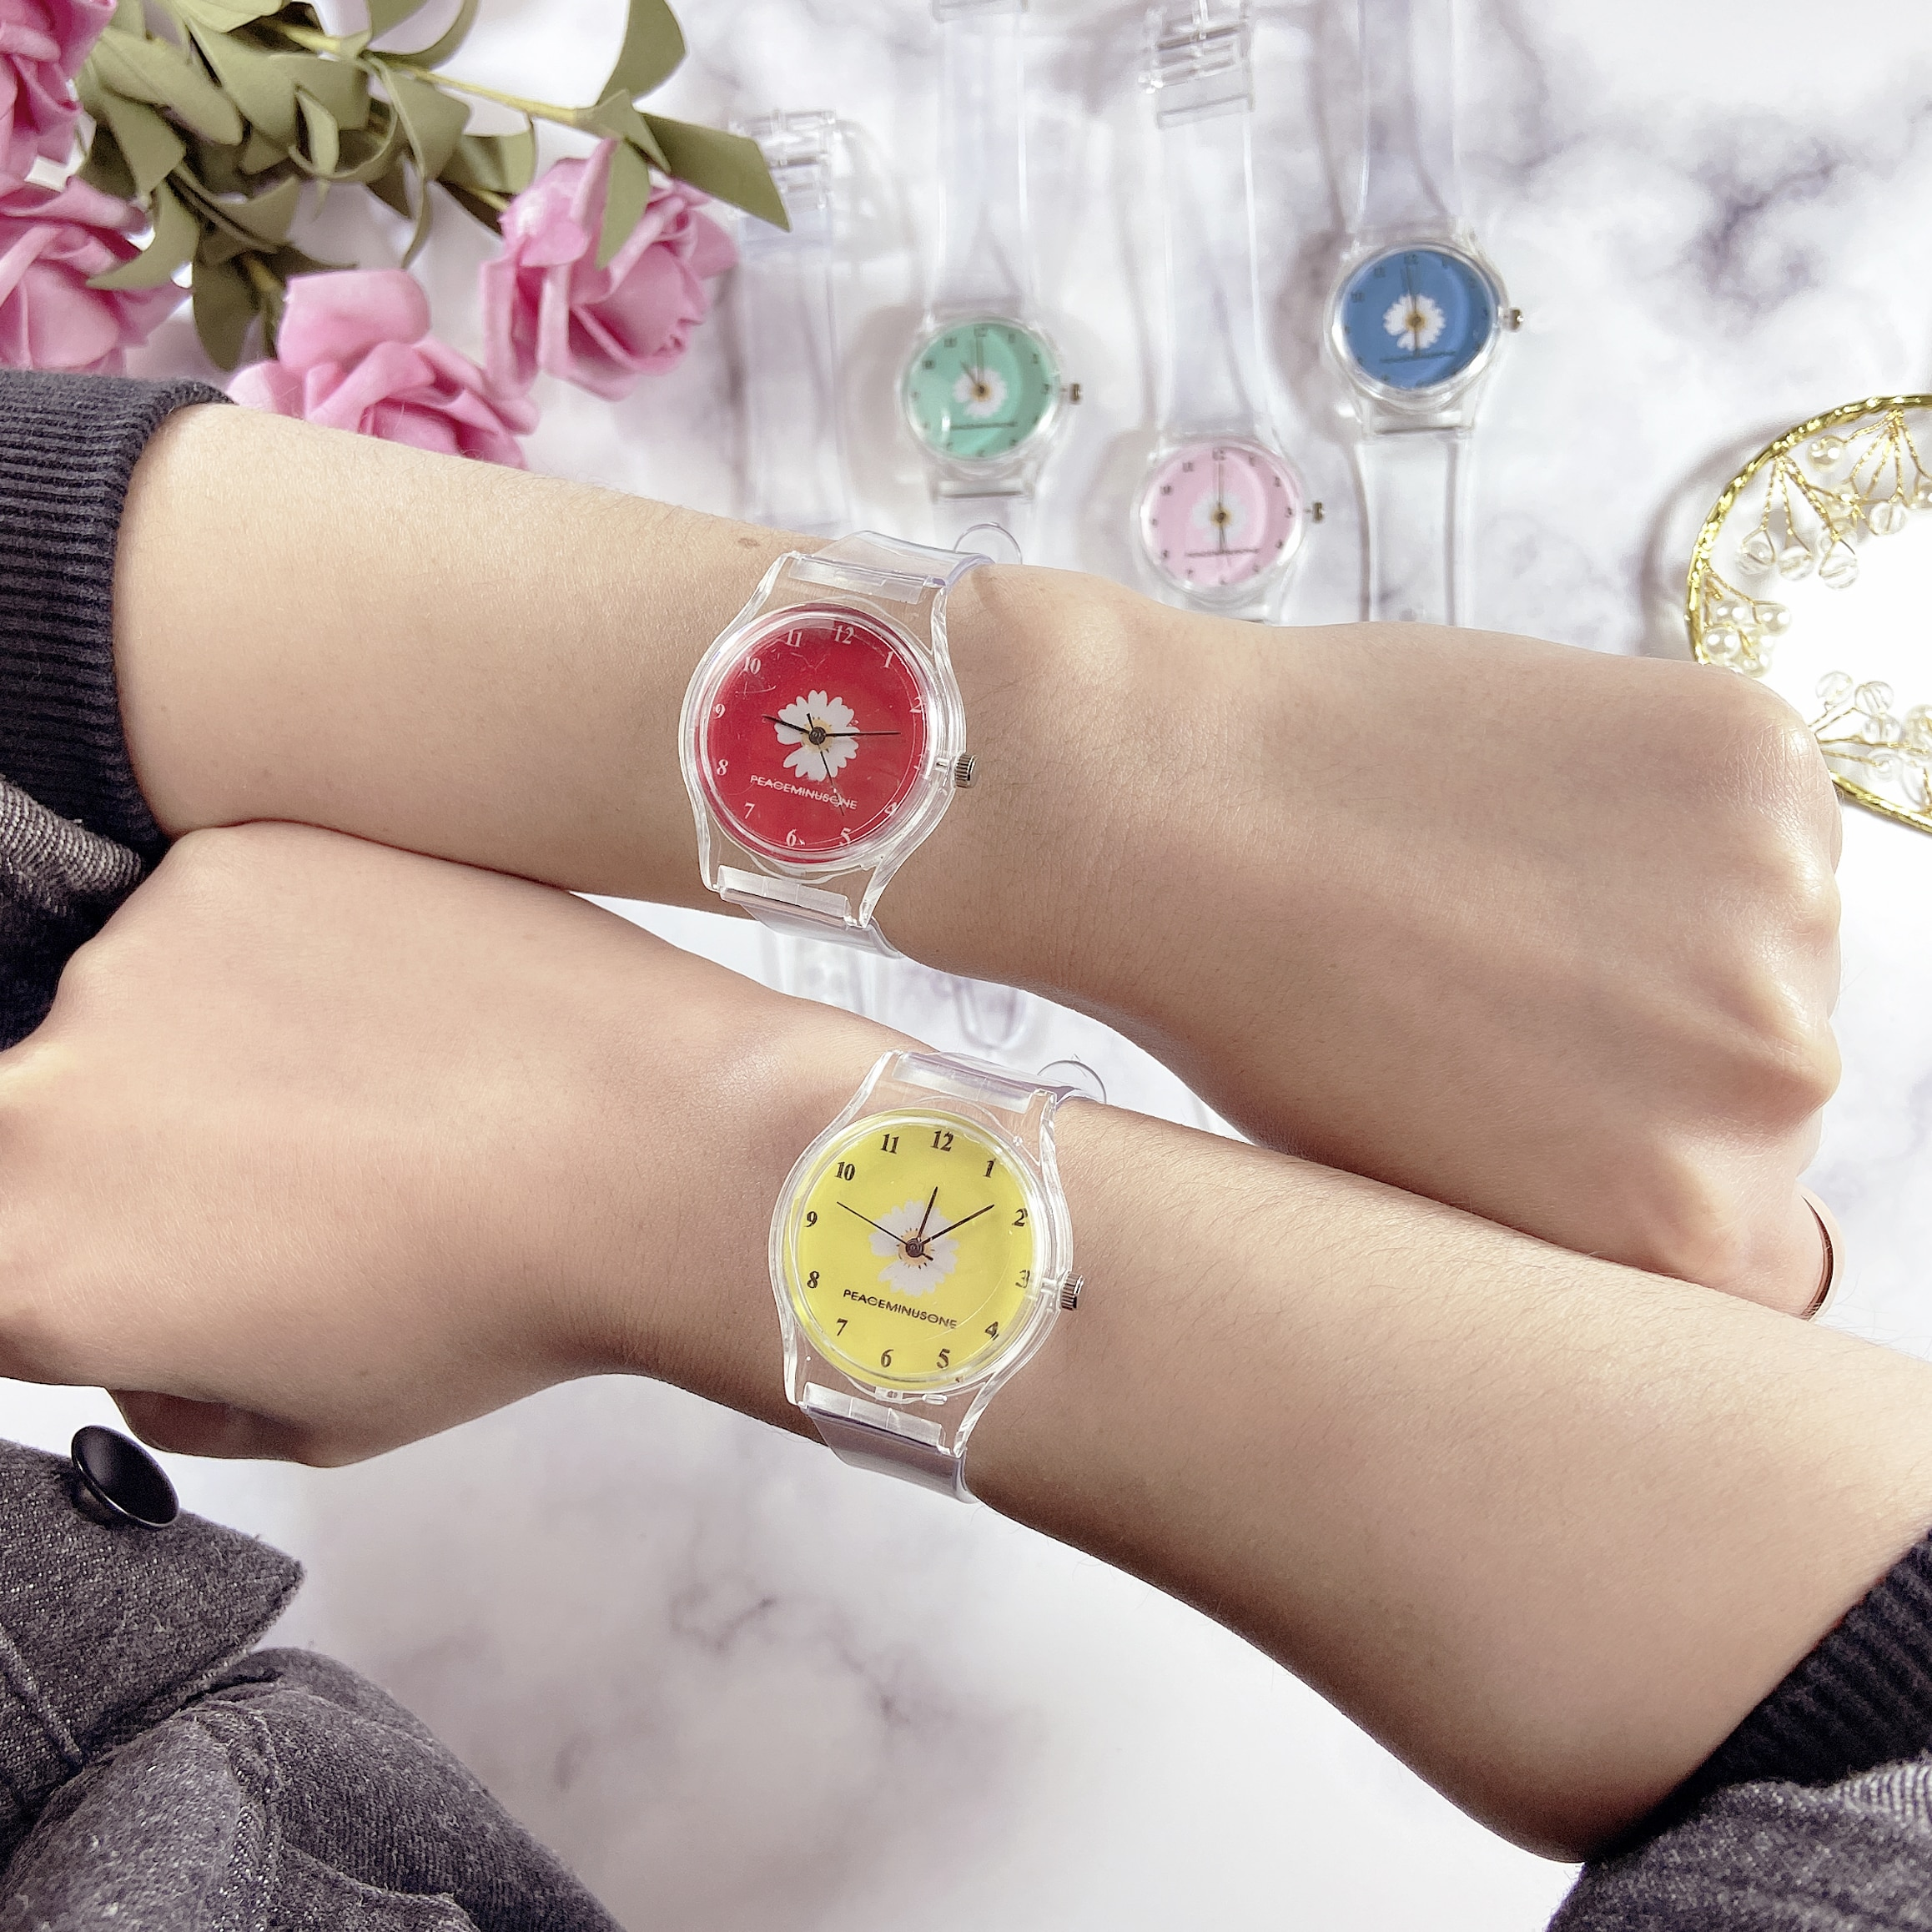 2020 small daisy elegant flower watch ladies fashion casual quartz watch simple ladies clock gift simple small часы женские